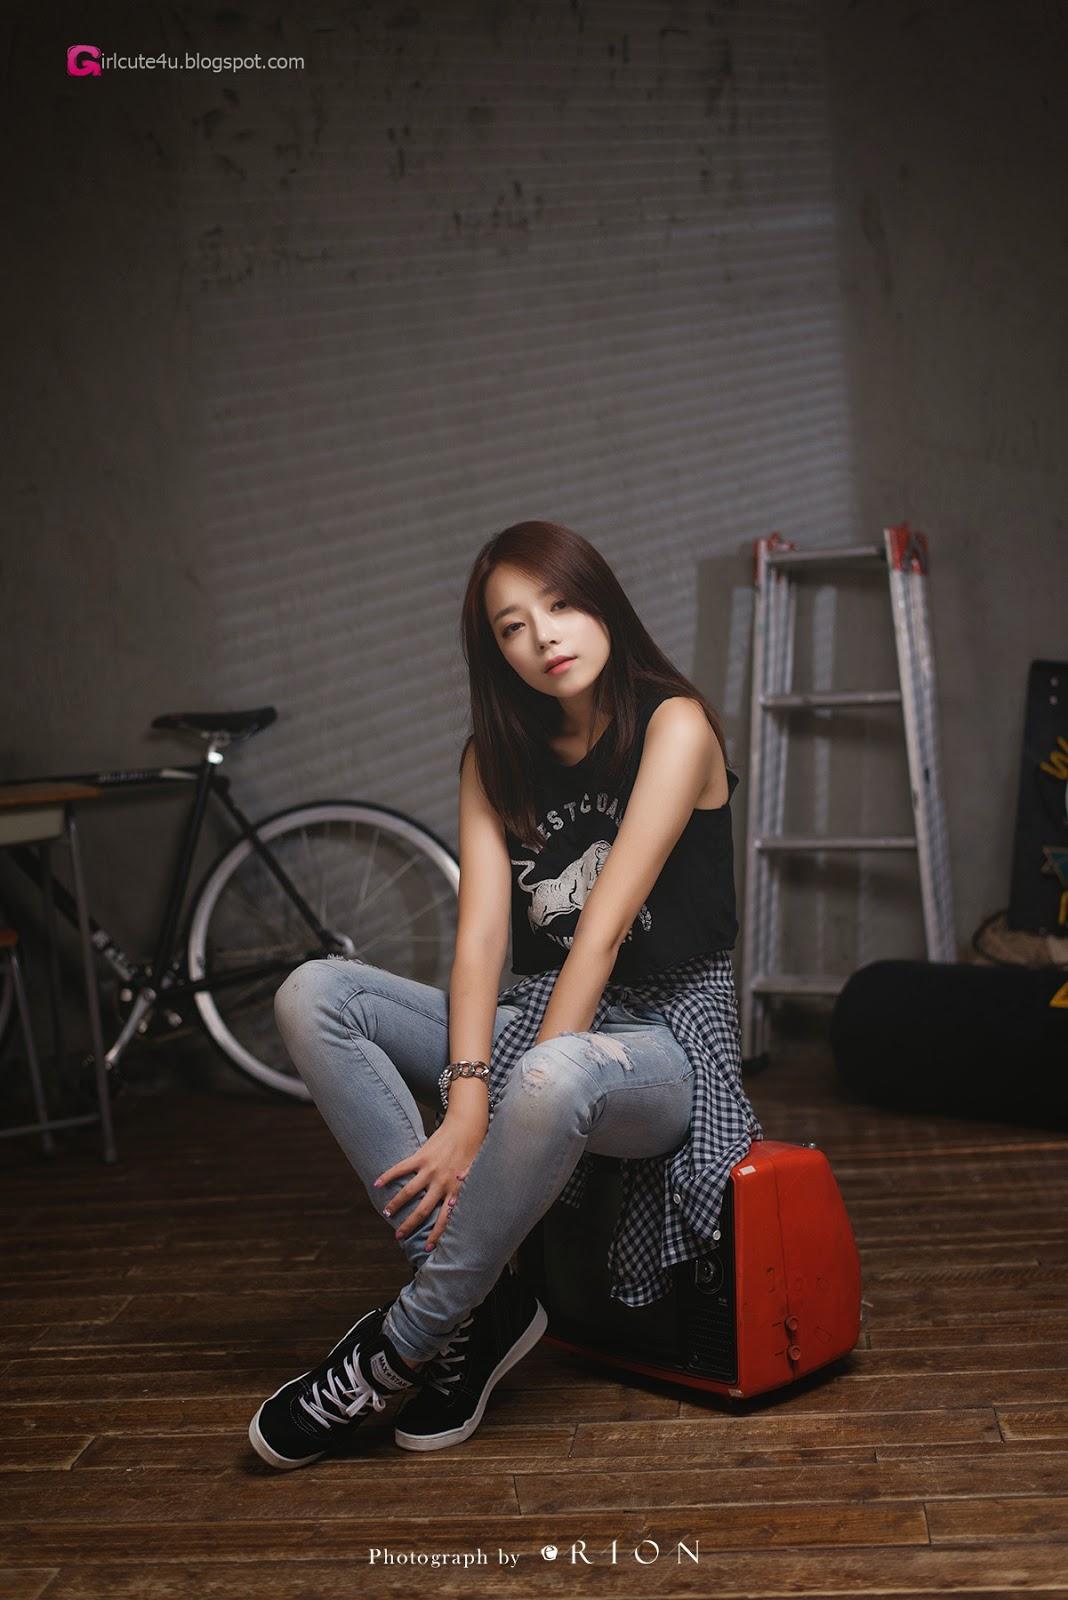 2 The wonderful Ji Yeon in 3 new sets - very cute asian girl - girlcute4u.blogspot.com